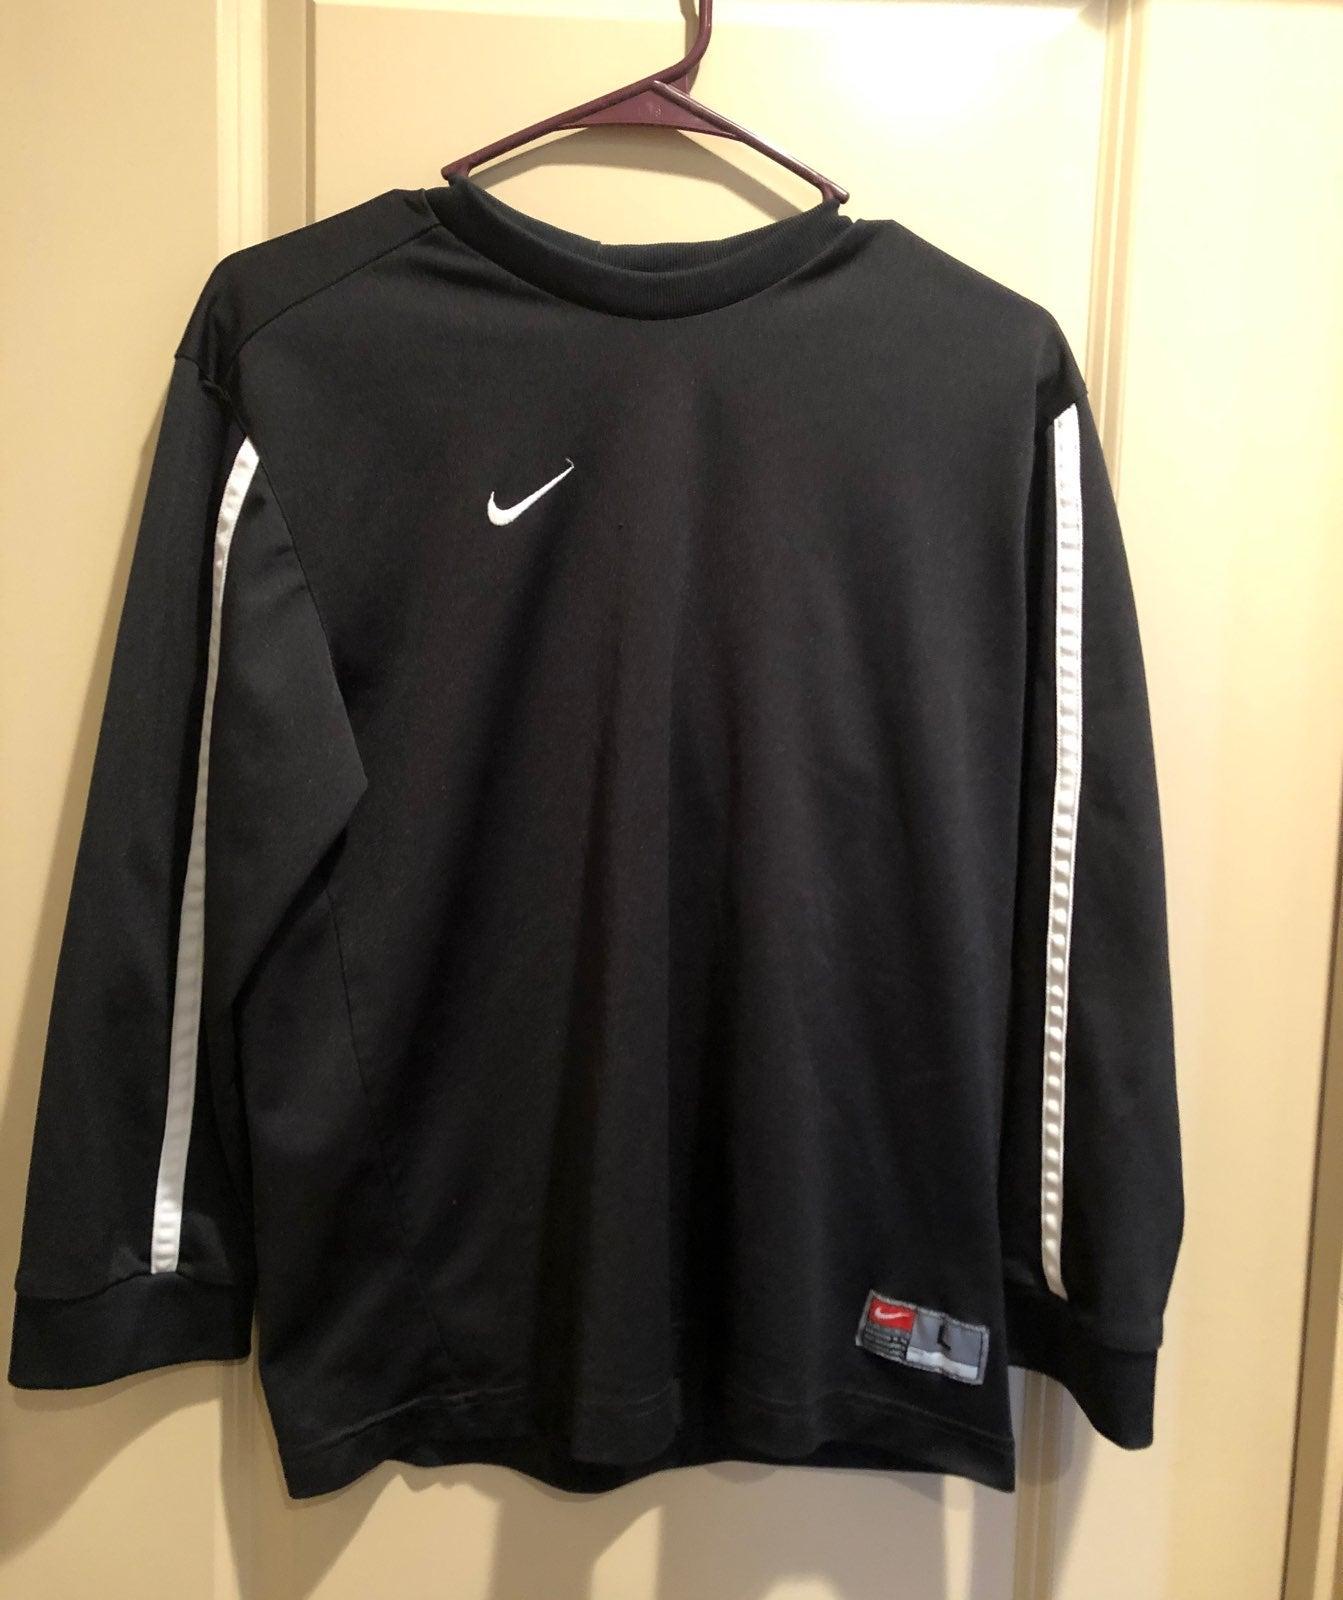 Nike Youth Long Sleeve Top